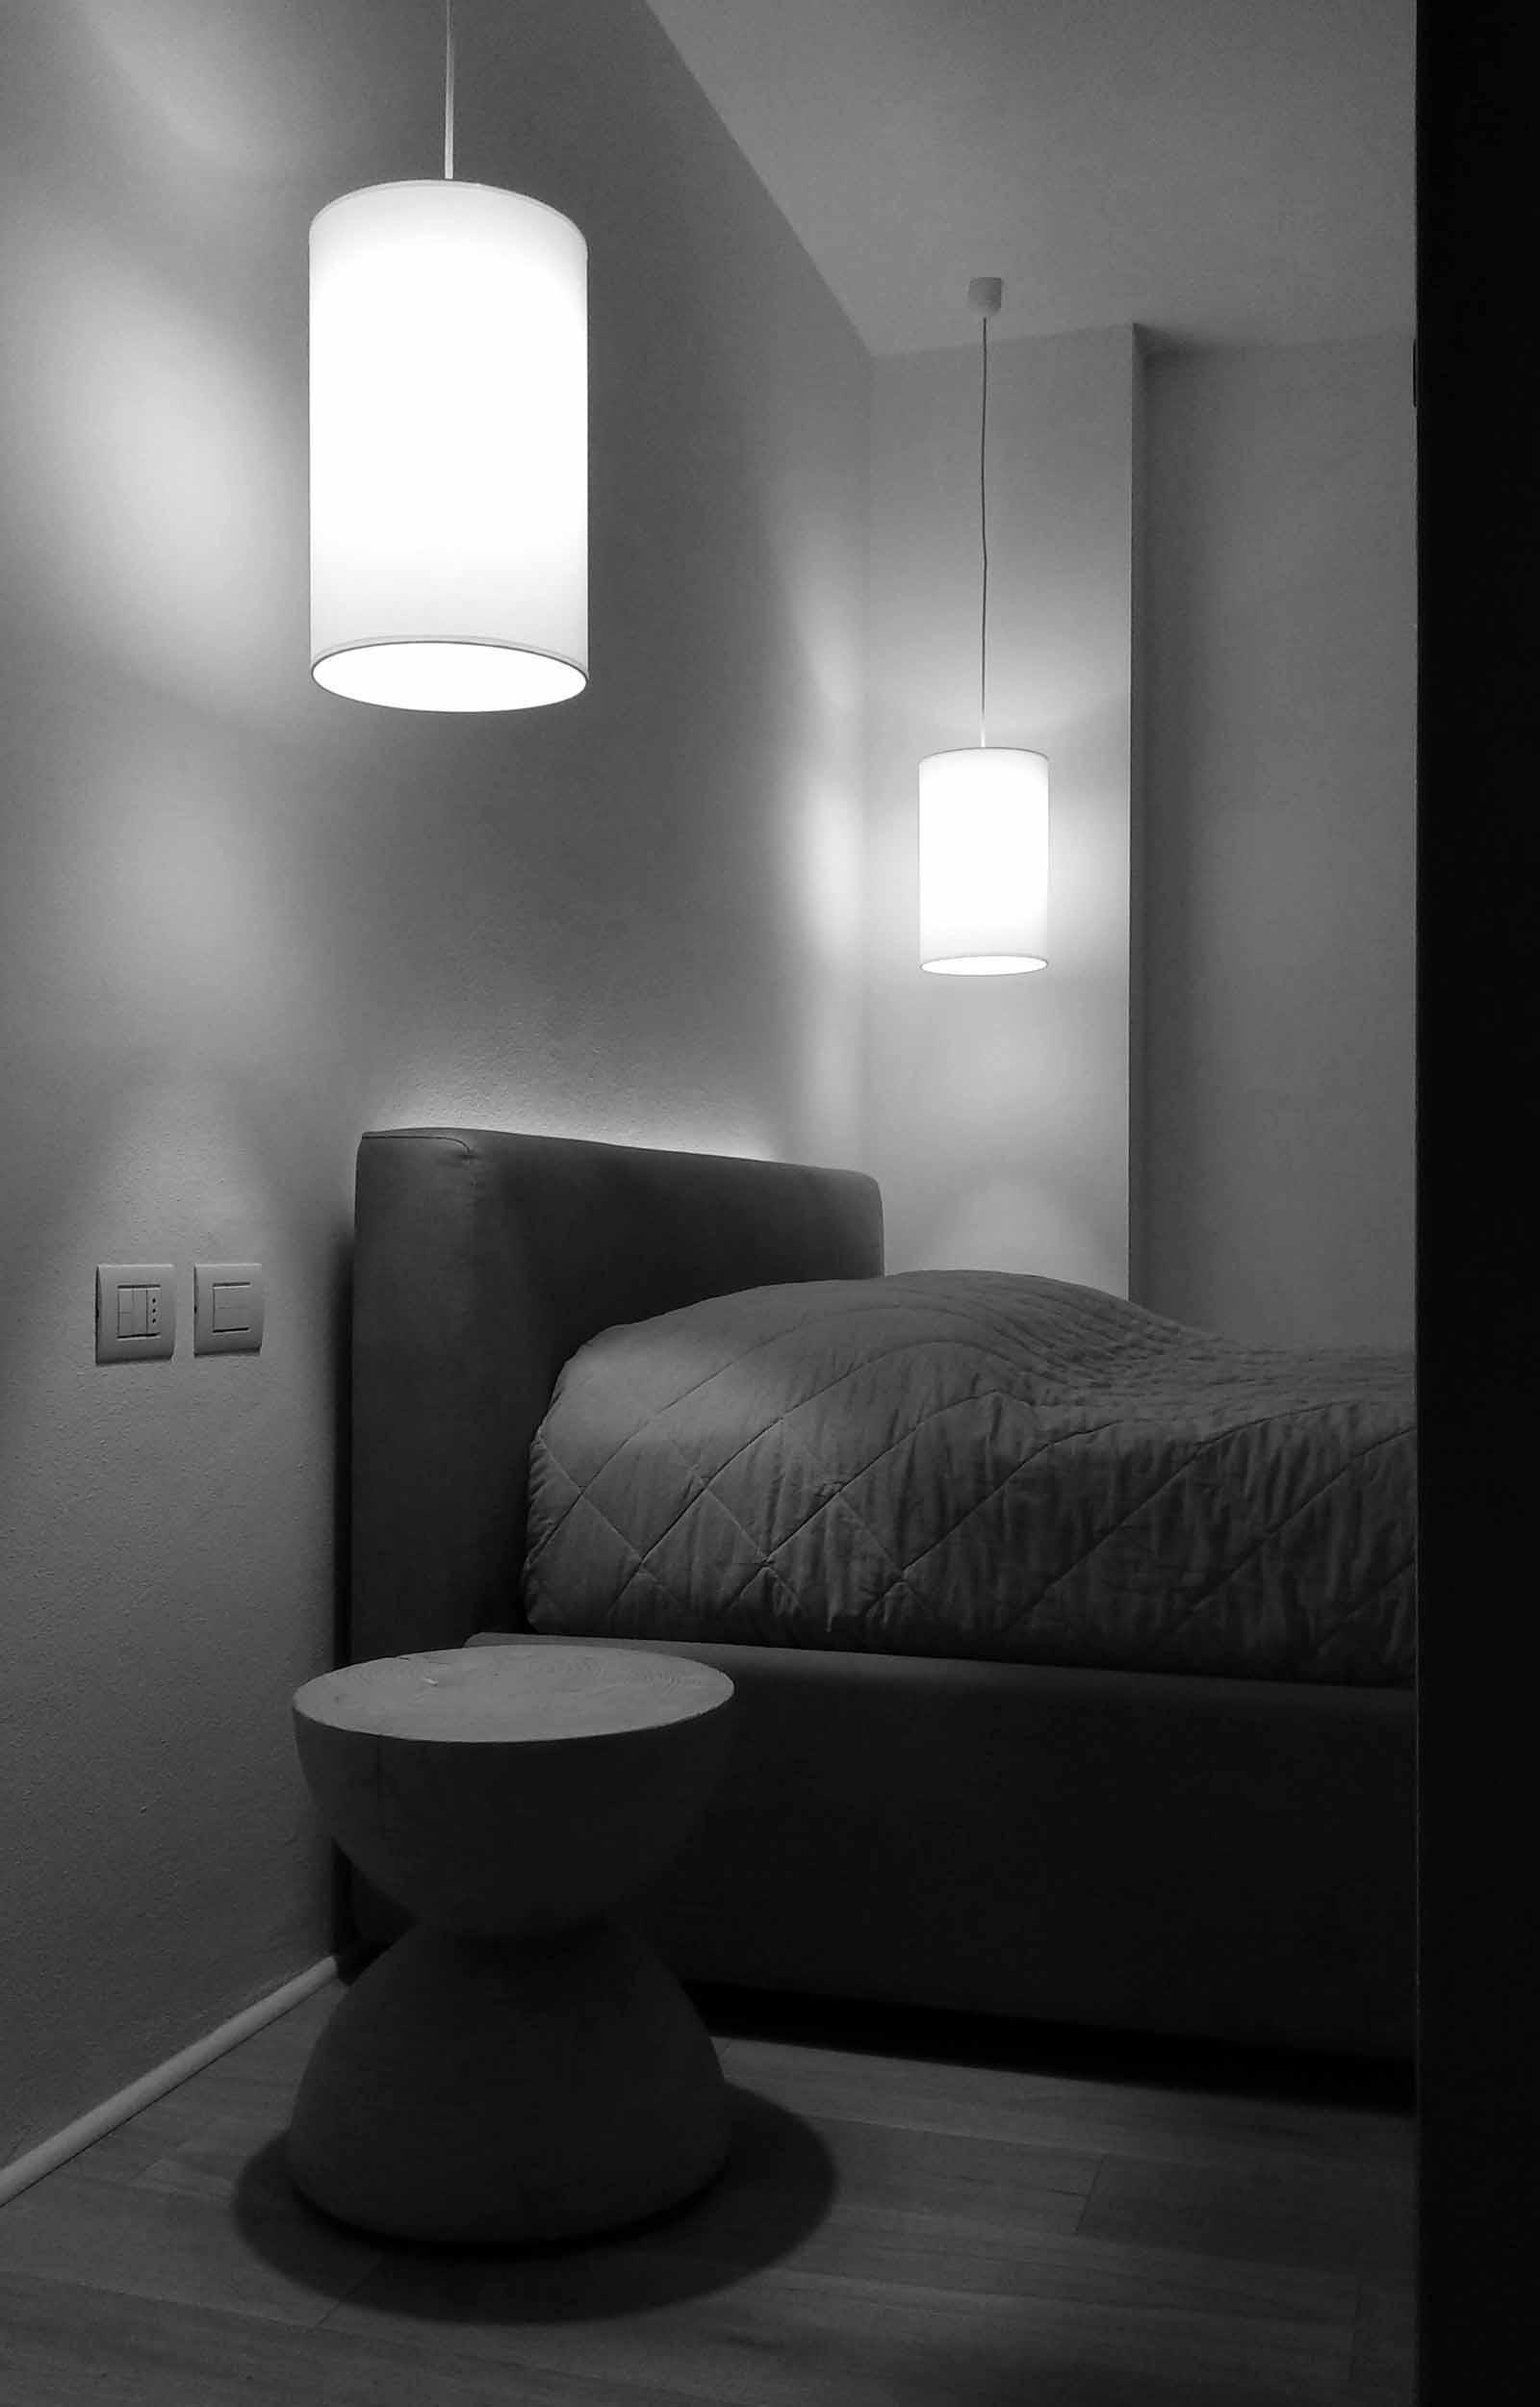 umberto_mauri_architetto_mauri_studio_lago_pusiano_como_bosisio_parini_private_renovation_house_residential_2000_06